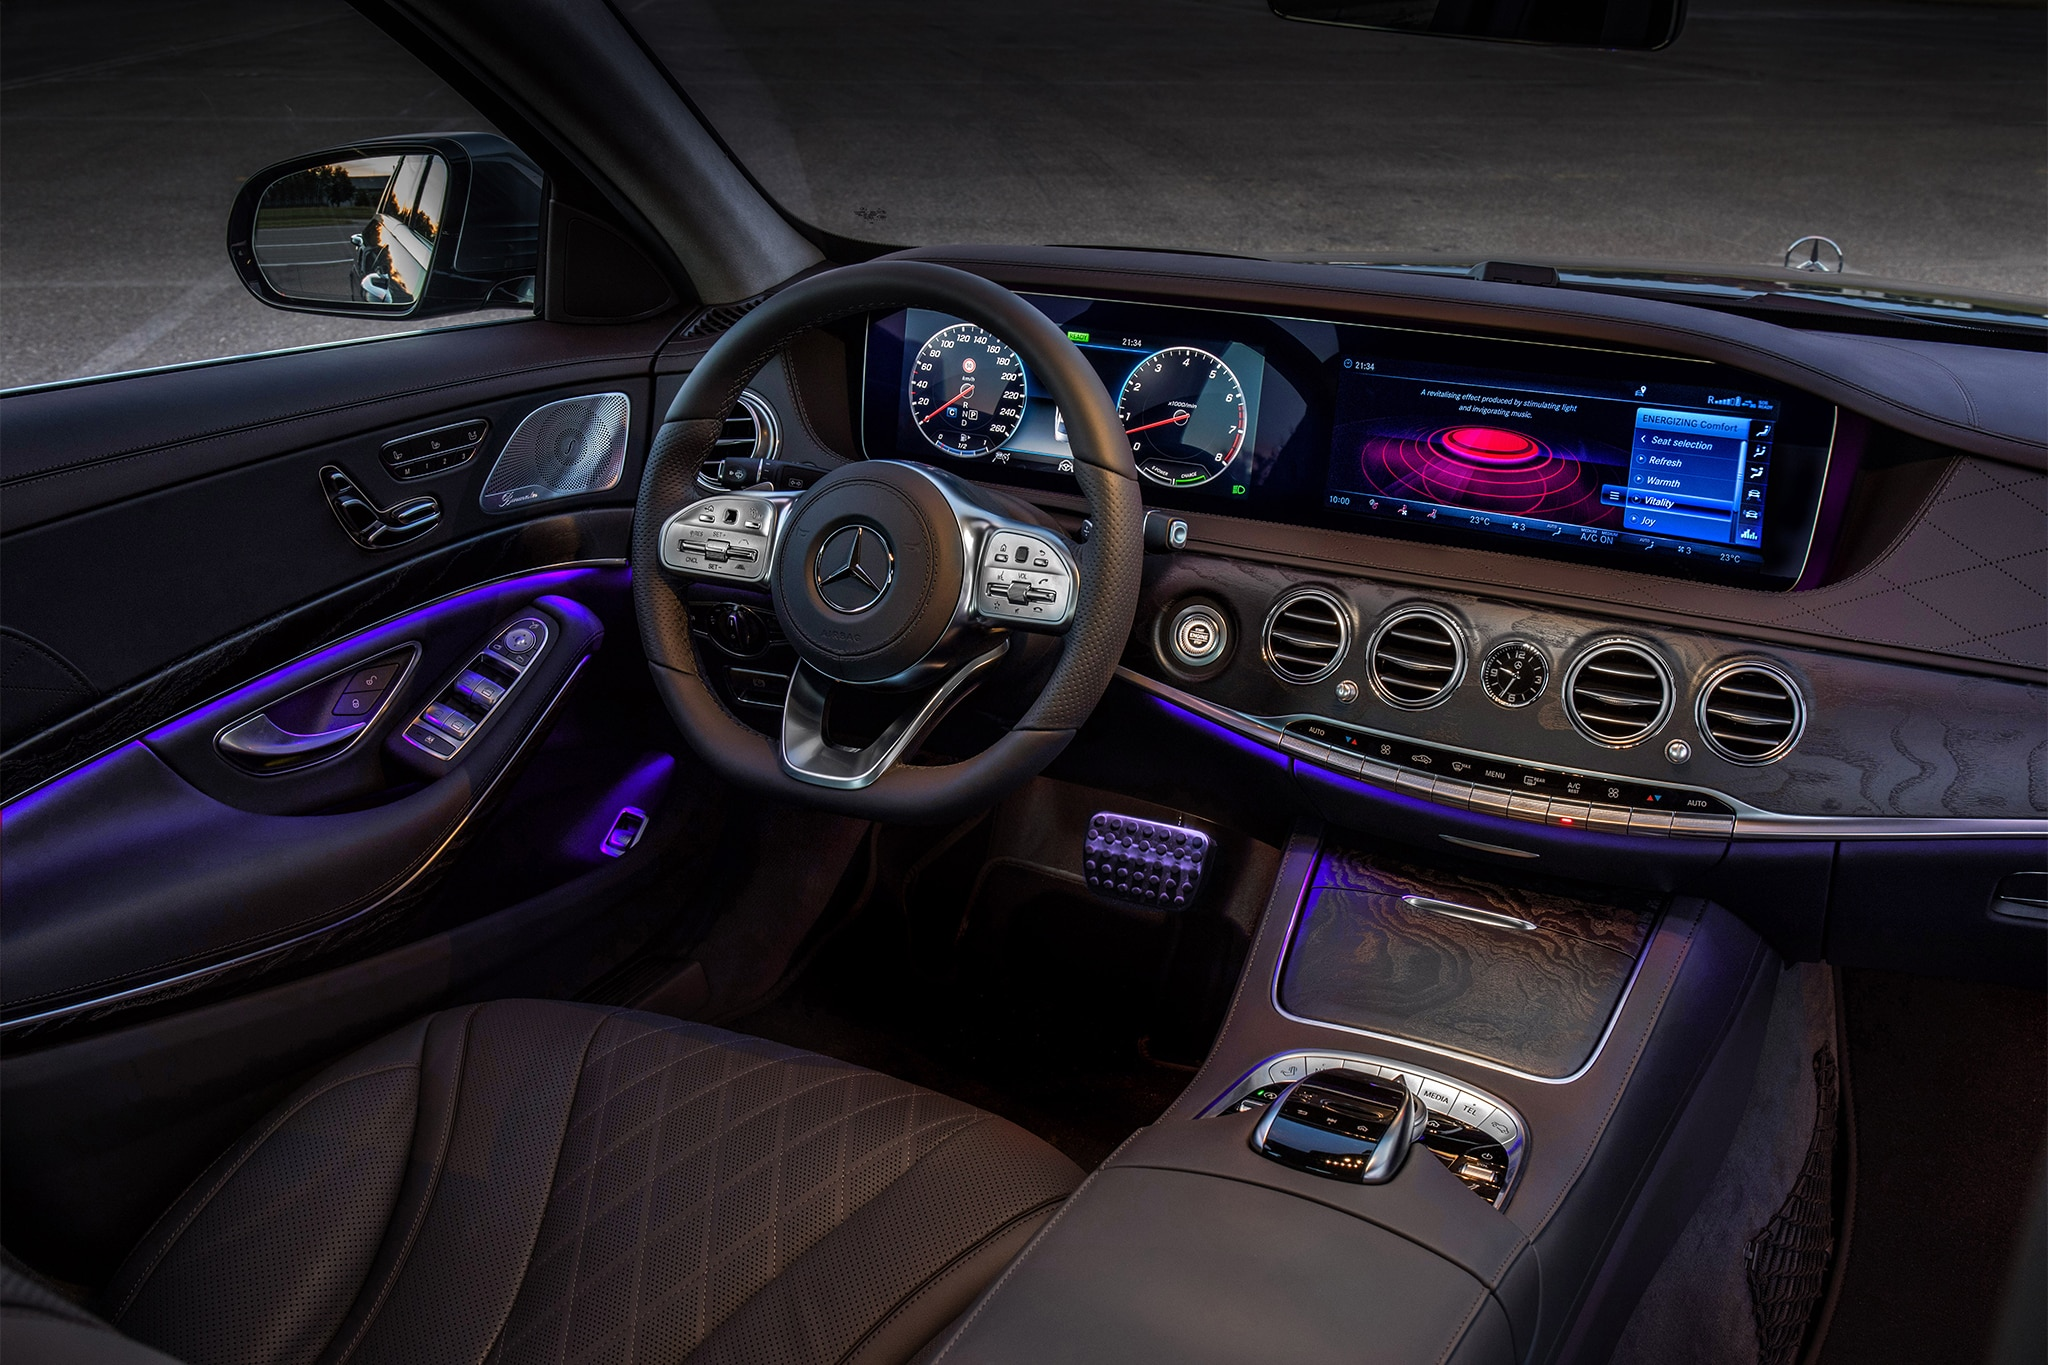 https://st.automobilemag.com/uploads/sites/11/2017/07/2018-Mercedes-Benz-S560-cabin-02.jpg